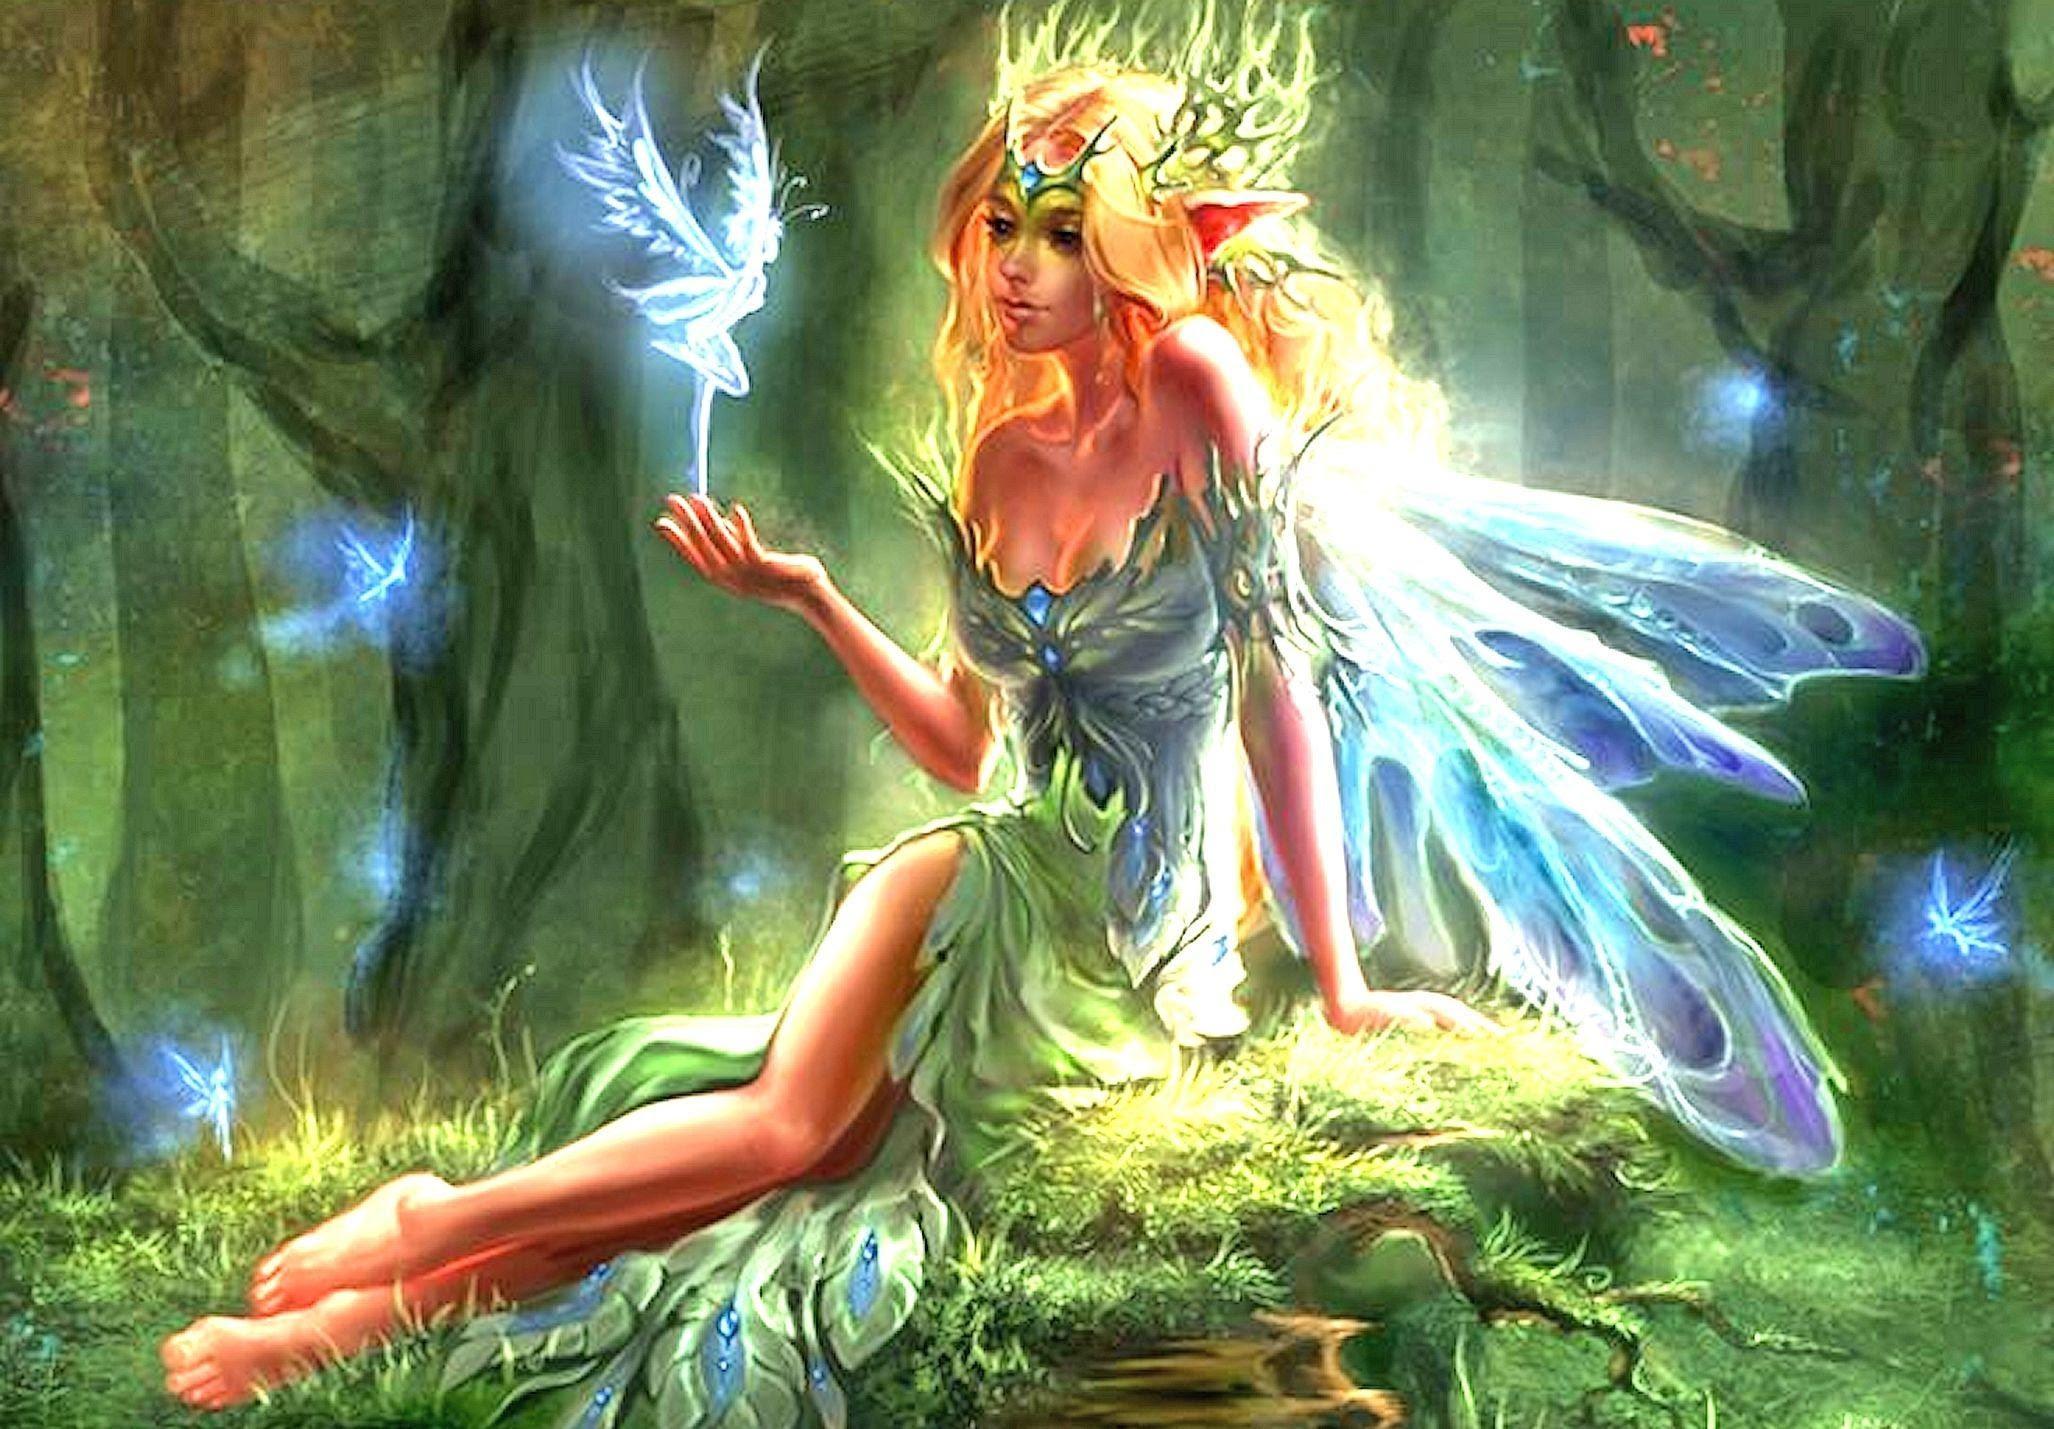 Fairies Wallpaper (62+ images)